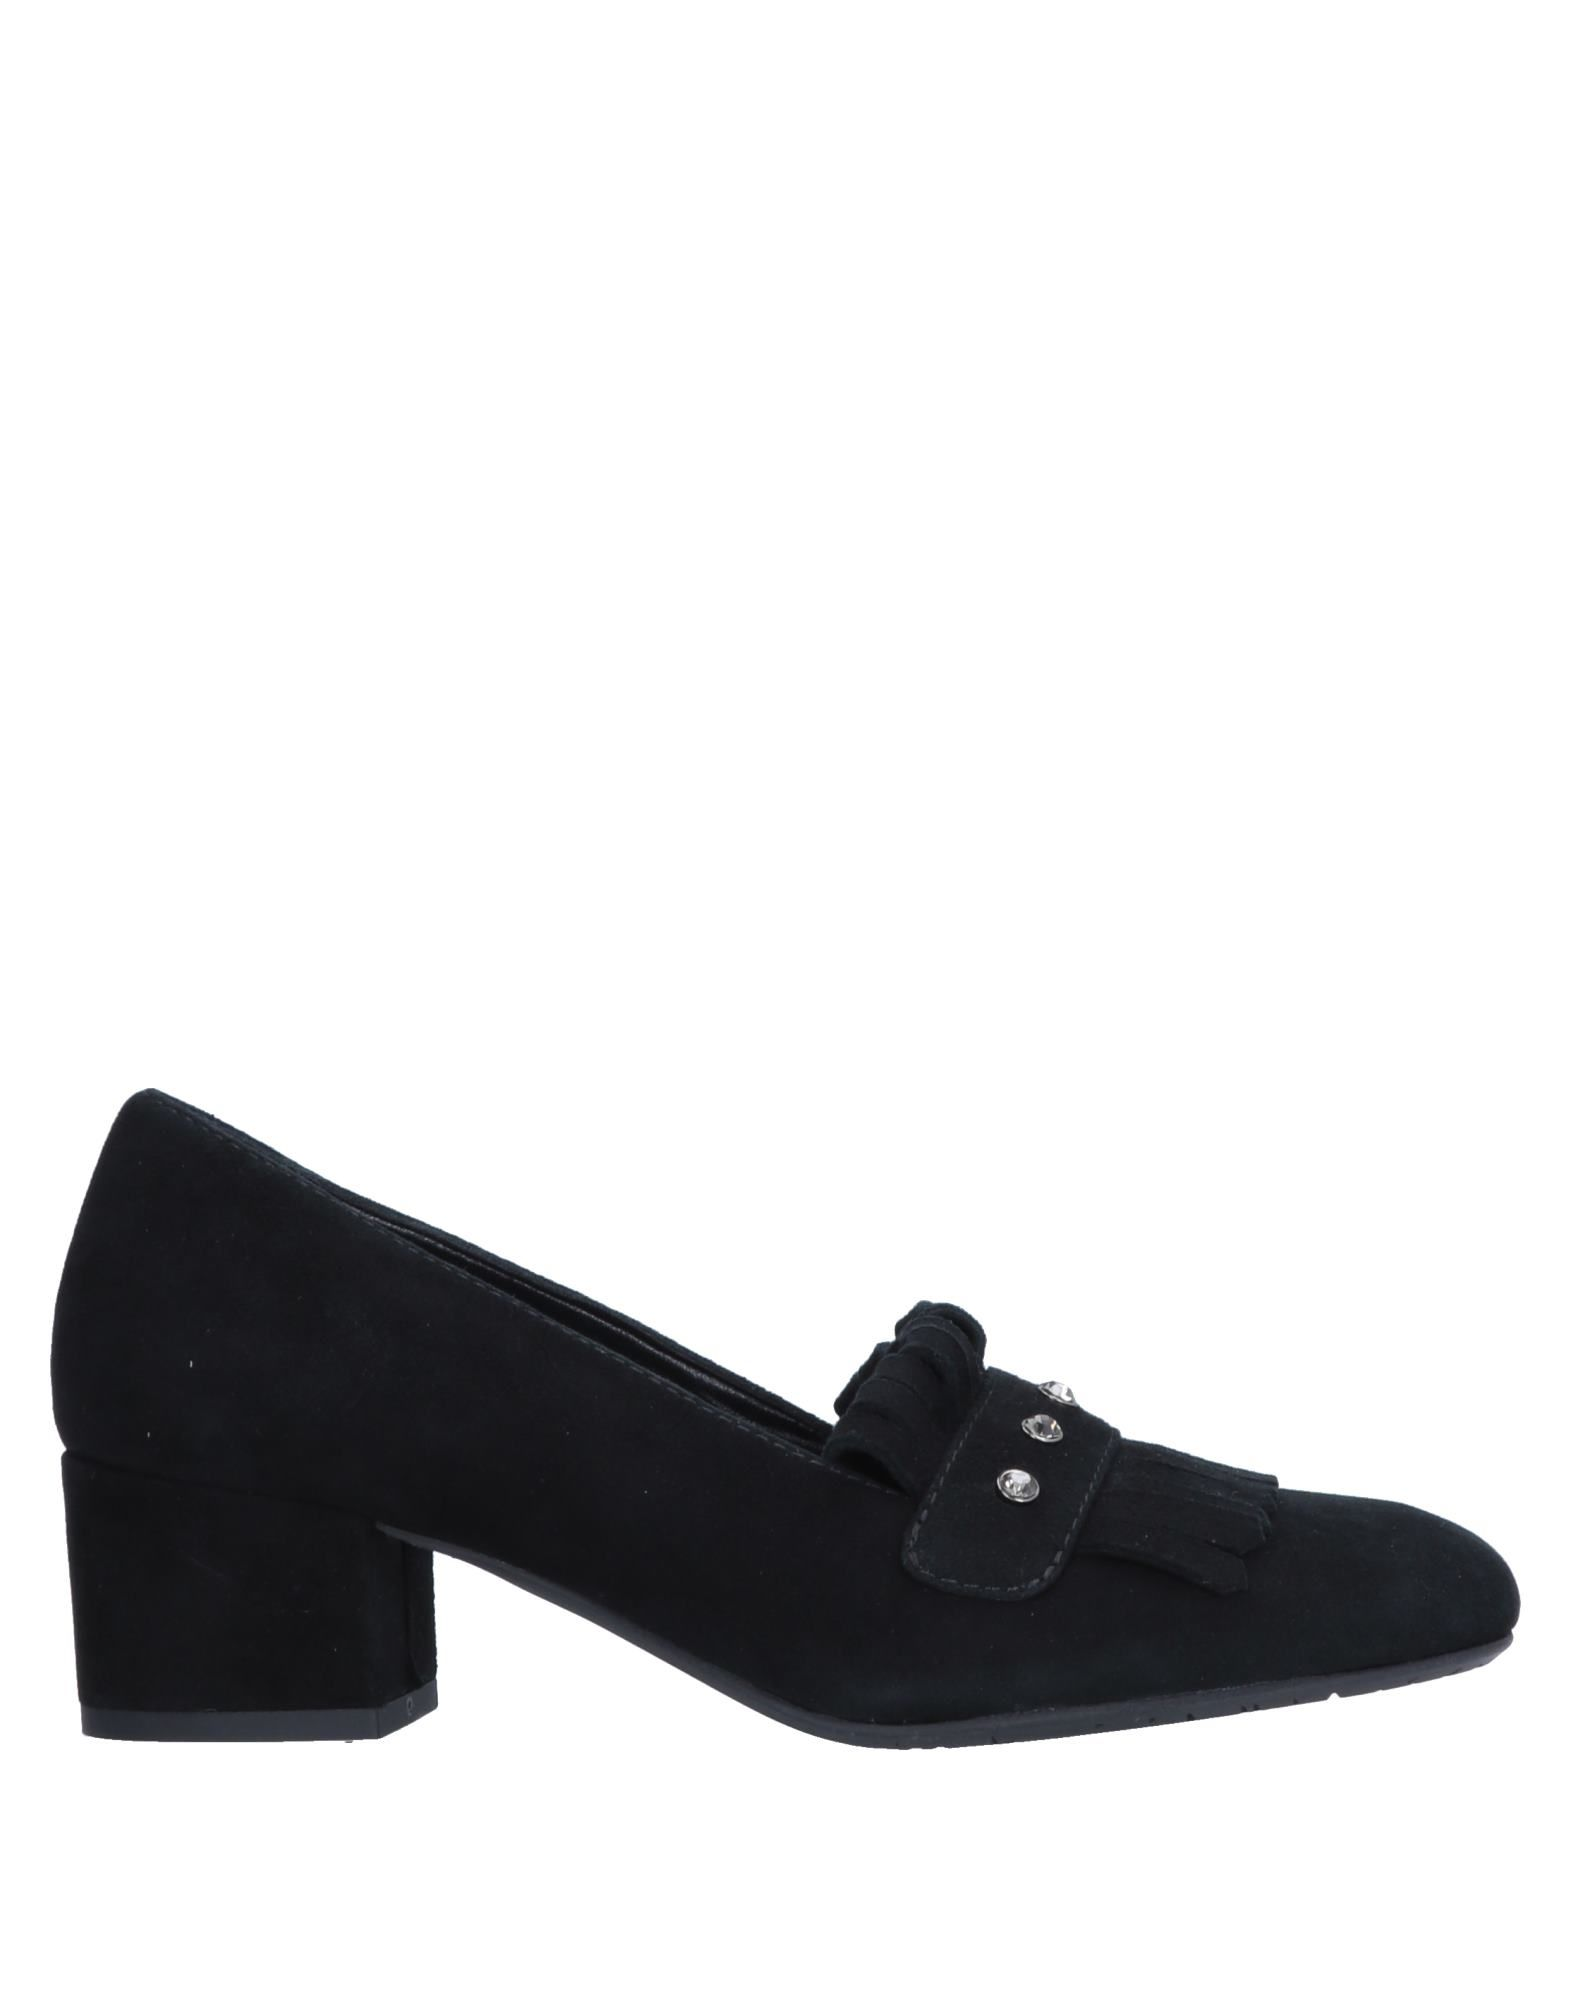 Tiffi 11548139DR Mokassins Damen  11548139DR Tiffi Gute Qualität beliebte Schuhe 08ad01